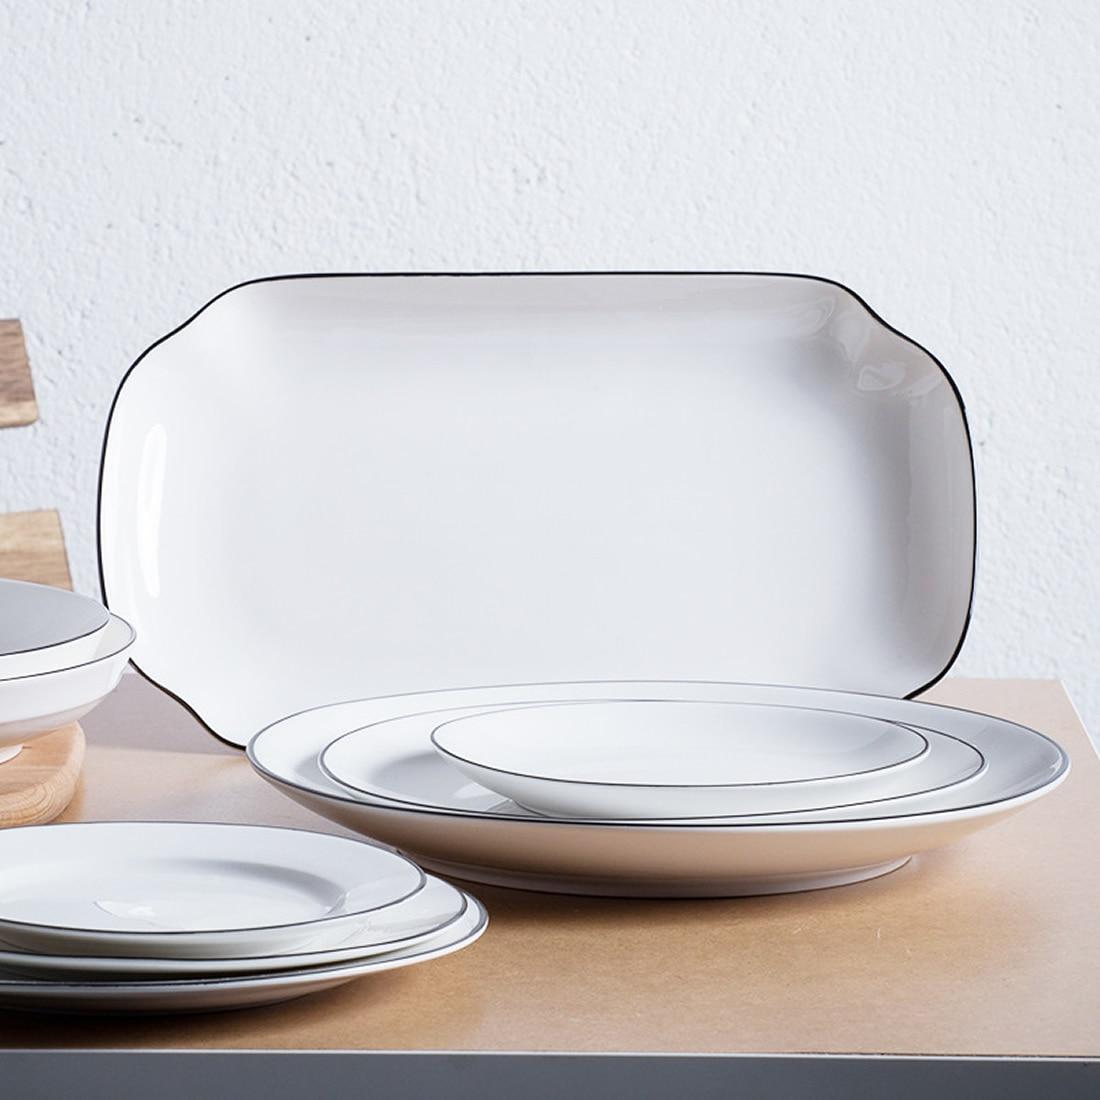 ceramics modern style white dishes table dish dessert dinner platesdinnerware sushi dishes snacks food bread kitchen tablewarein dishes plates from home . ceramics modern style white dishes table dish dessert dinner